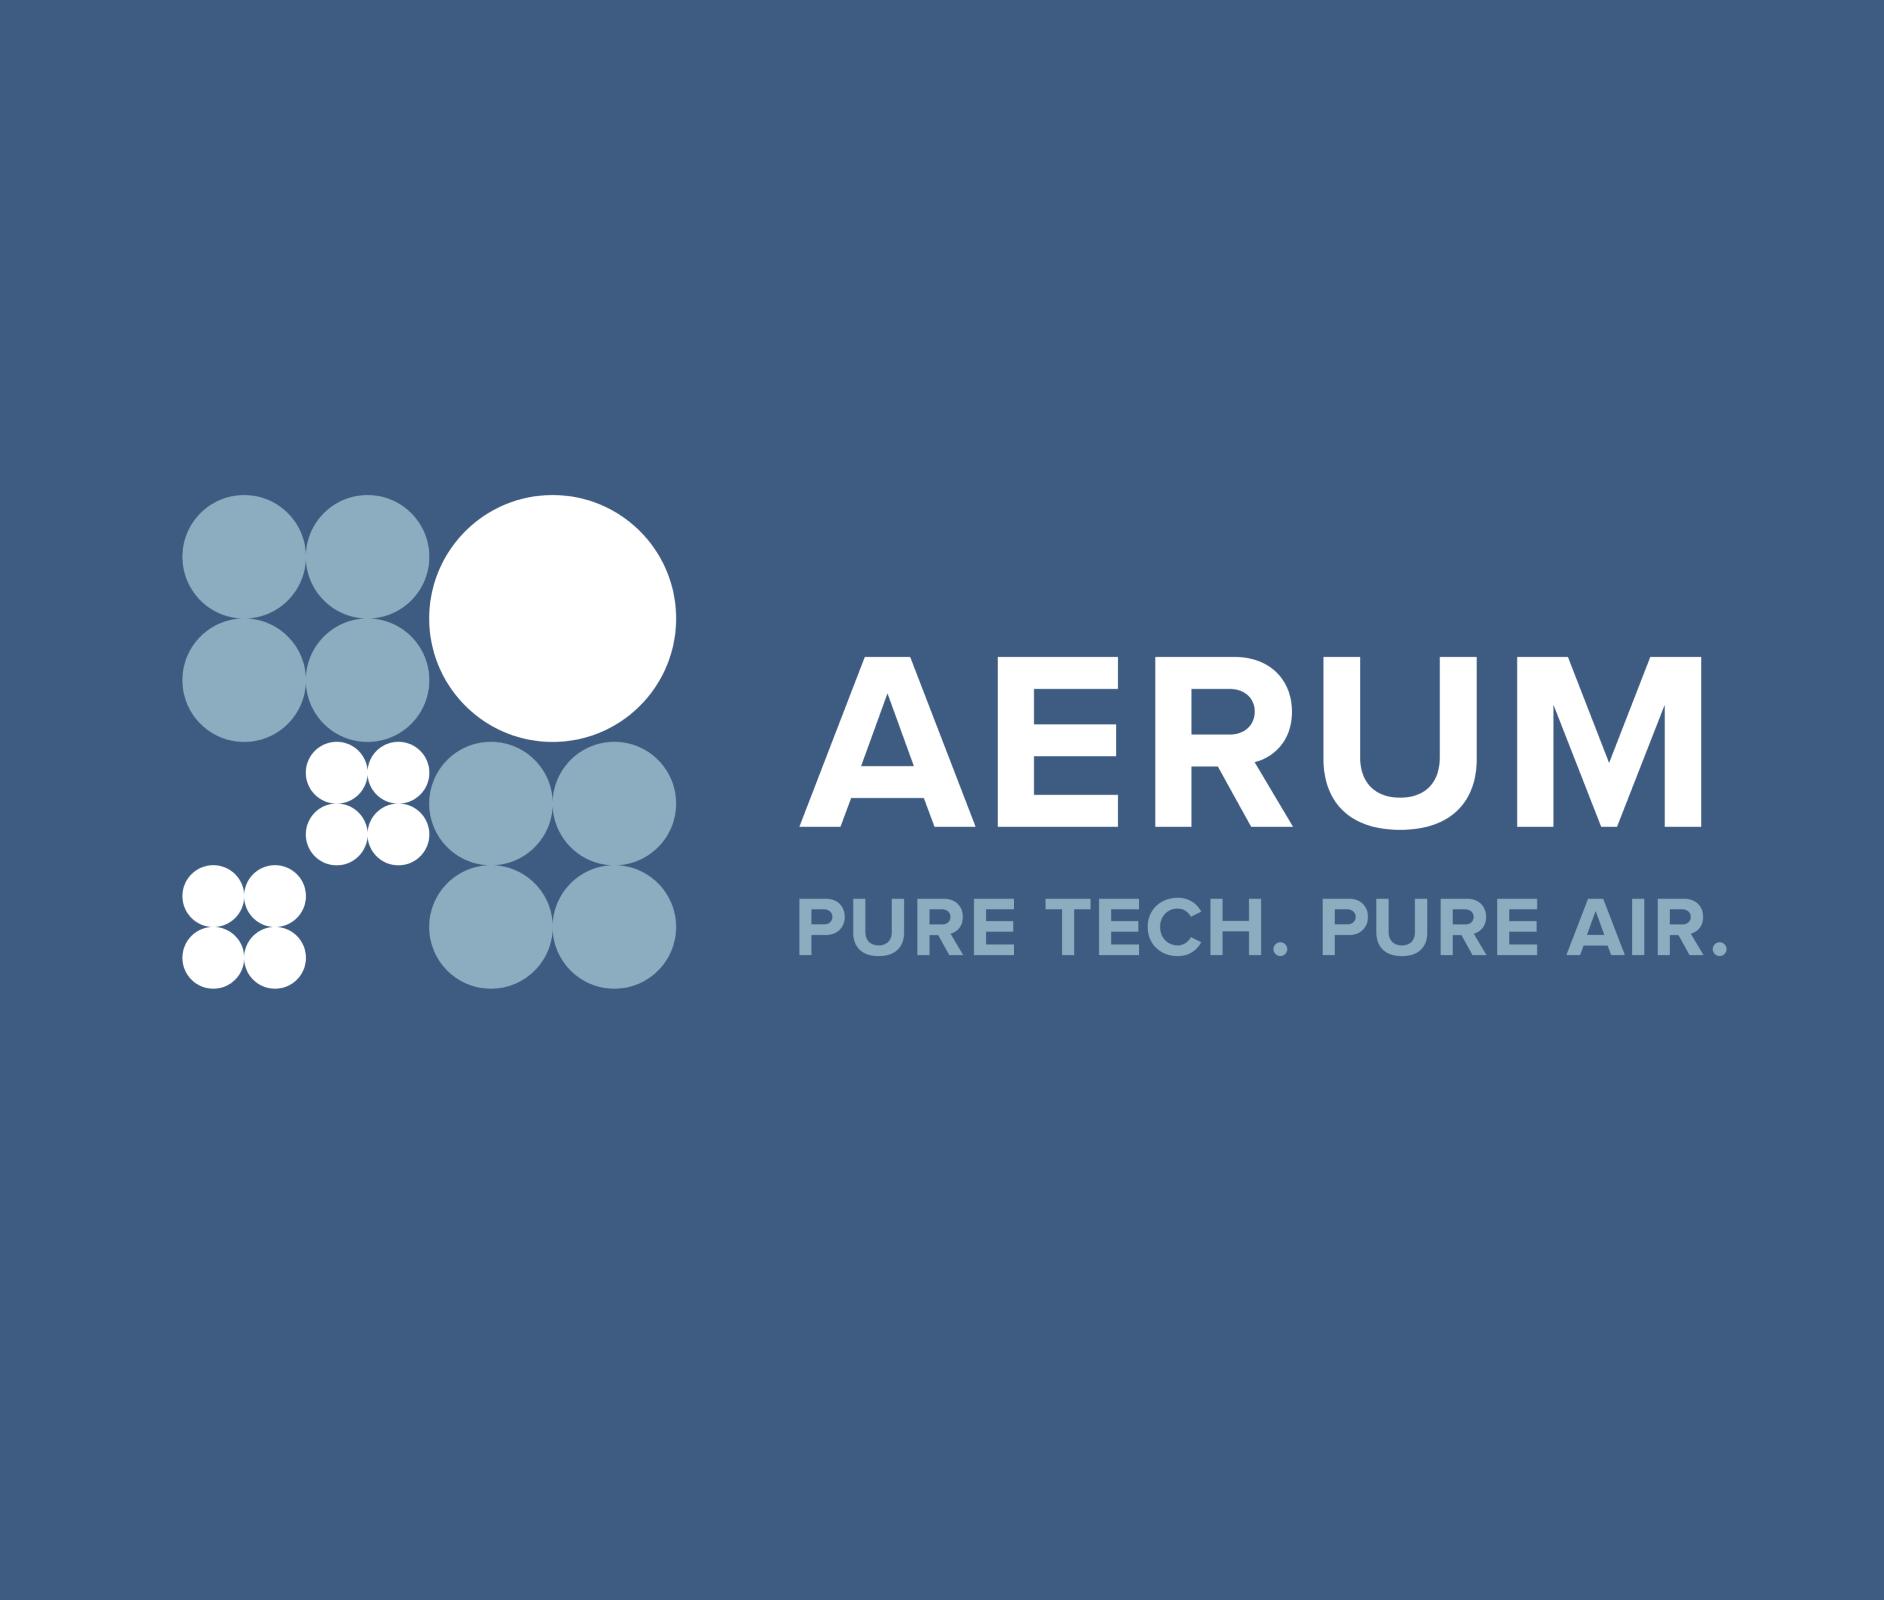 Aerum logo